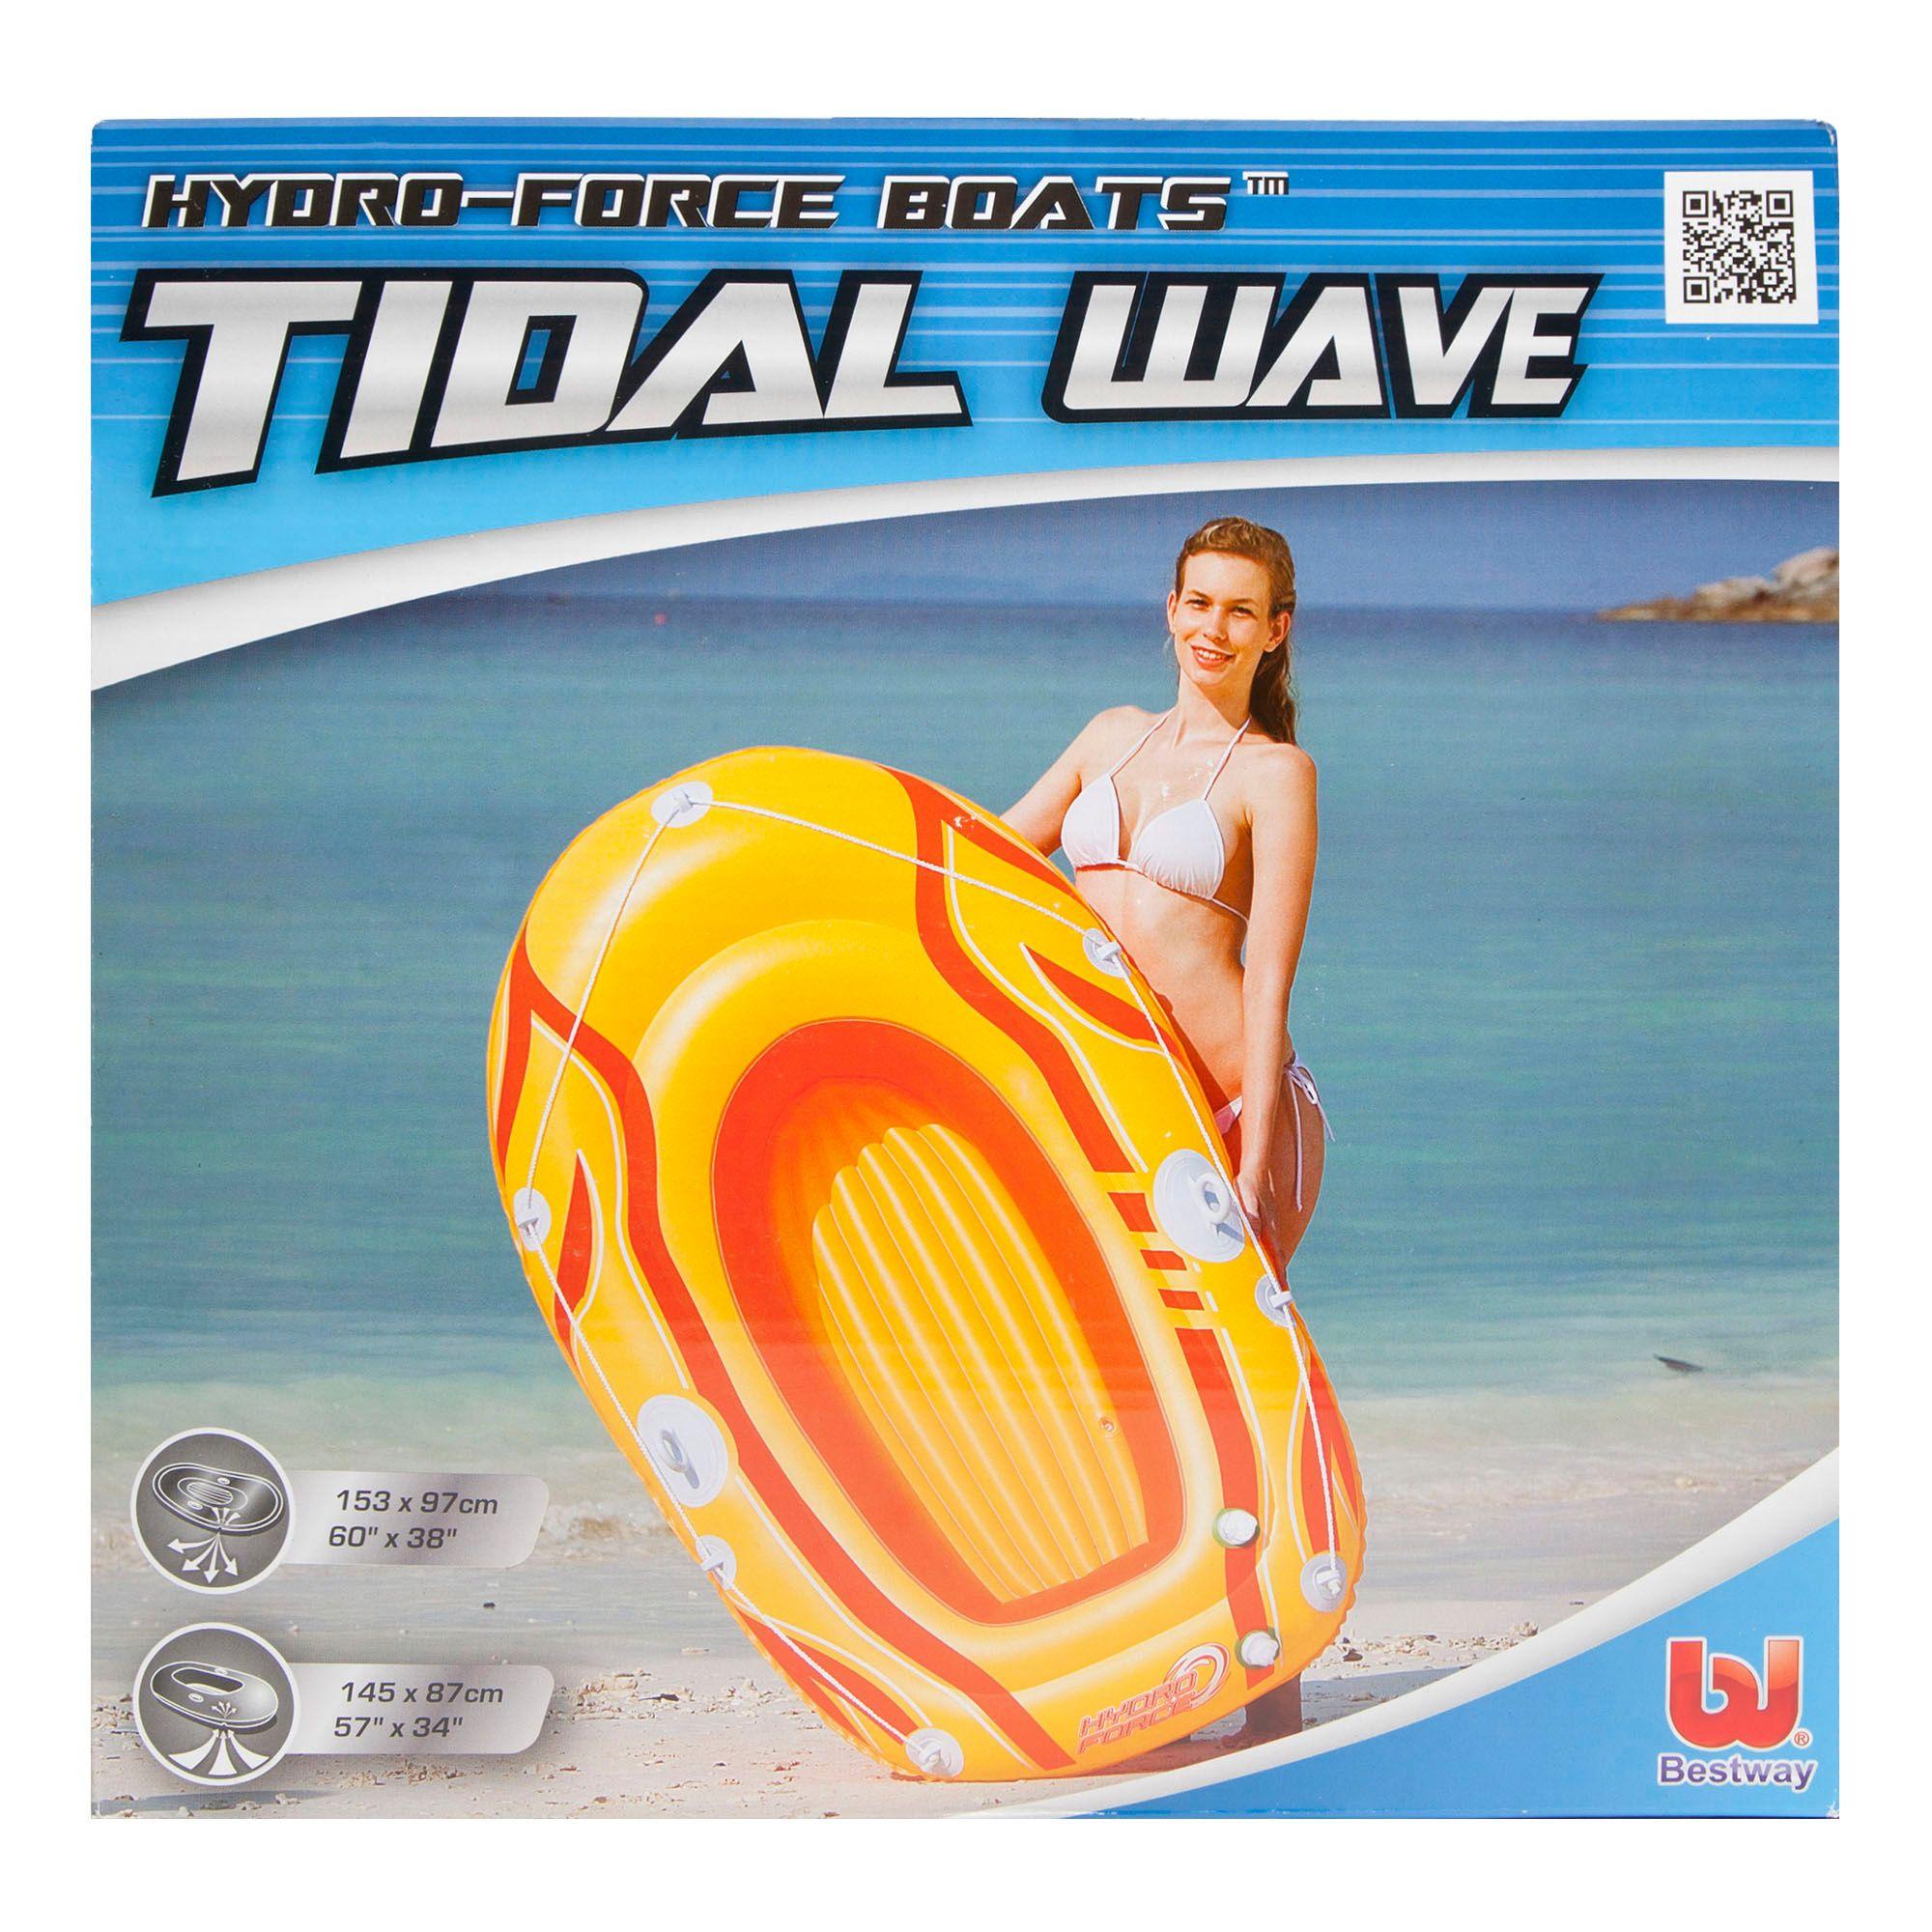 SUMMIT Hydro-Force Tidal Wave Dinghy 57 x 34